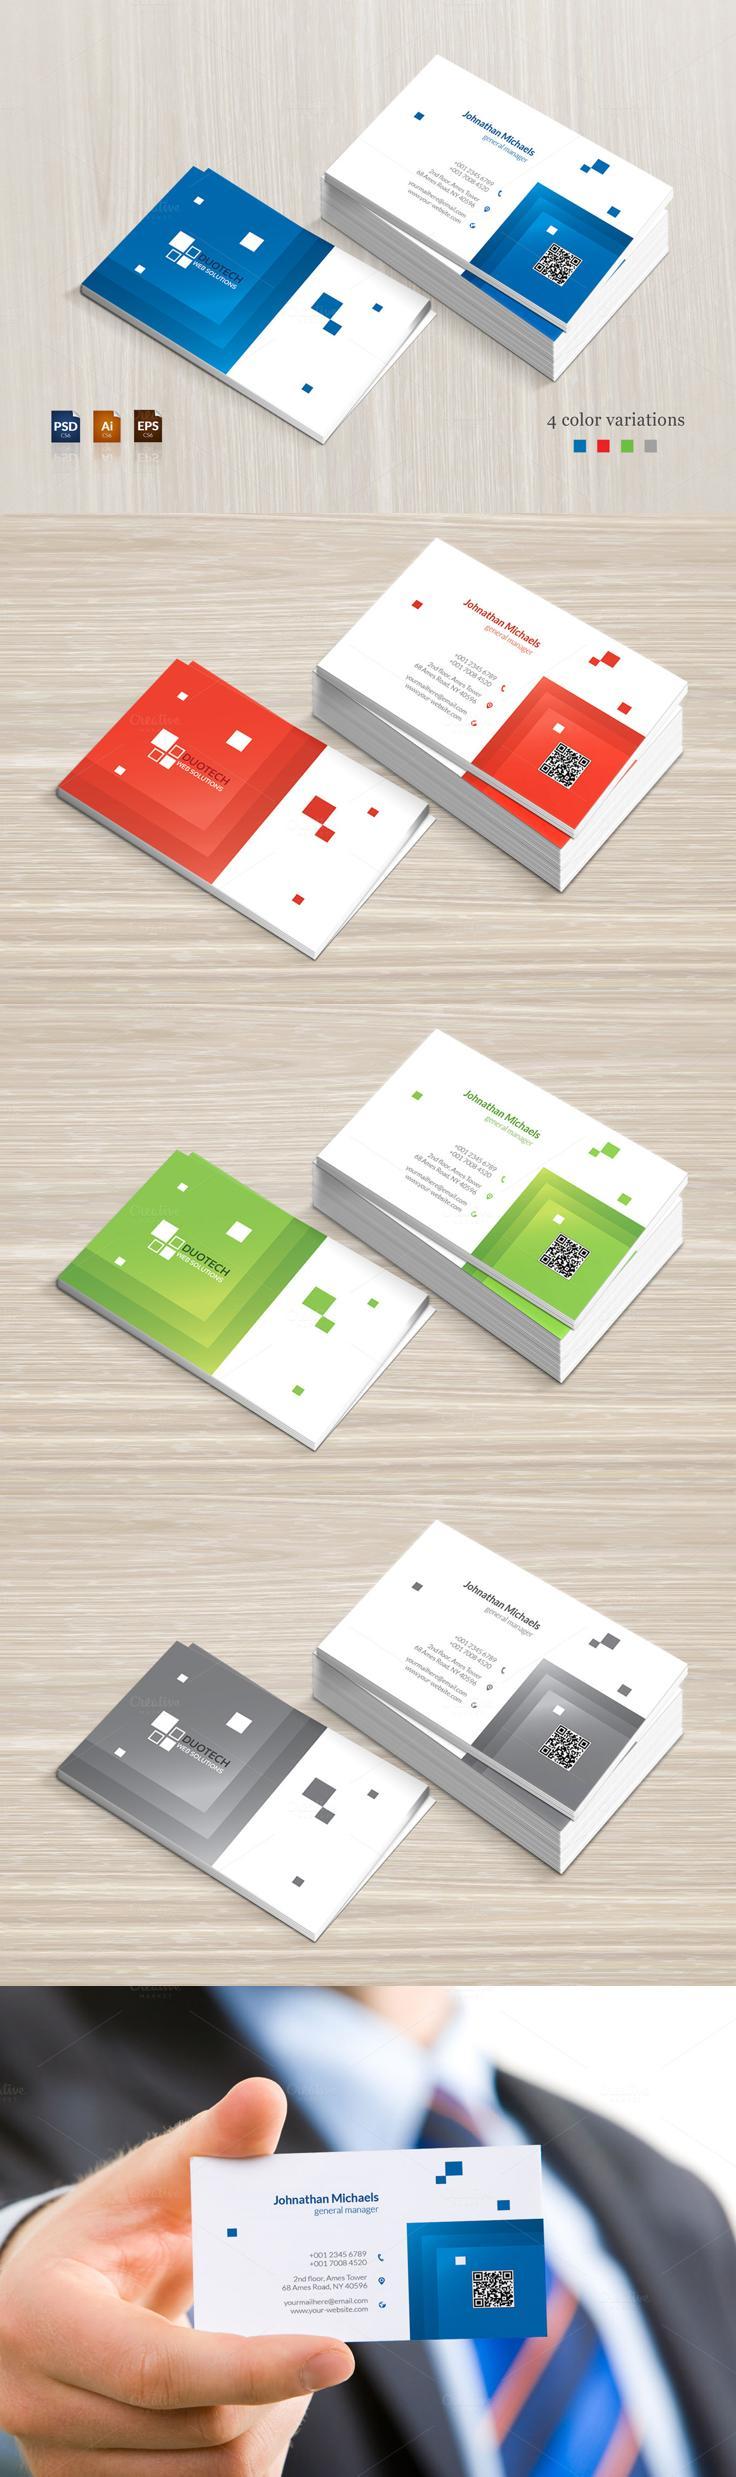 #businesscard #design from BettyDesign | DOWNLOAD: https://creativemarket.com/BettyDesign/669342-Creative-Business-Card?u=zsoltczigler